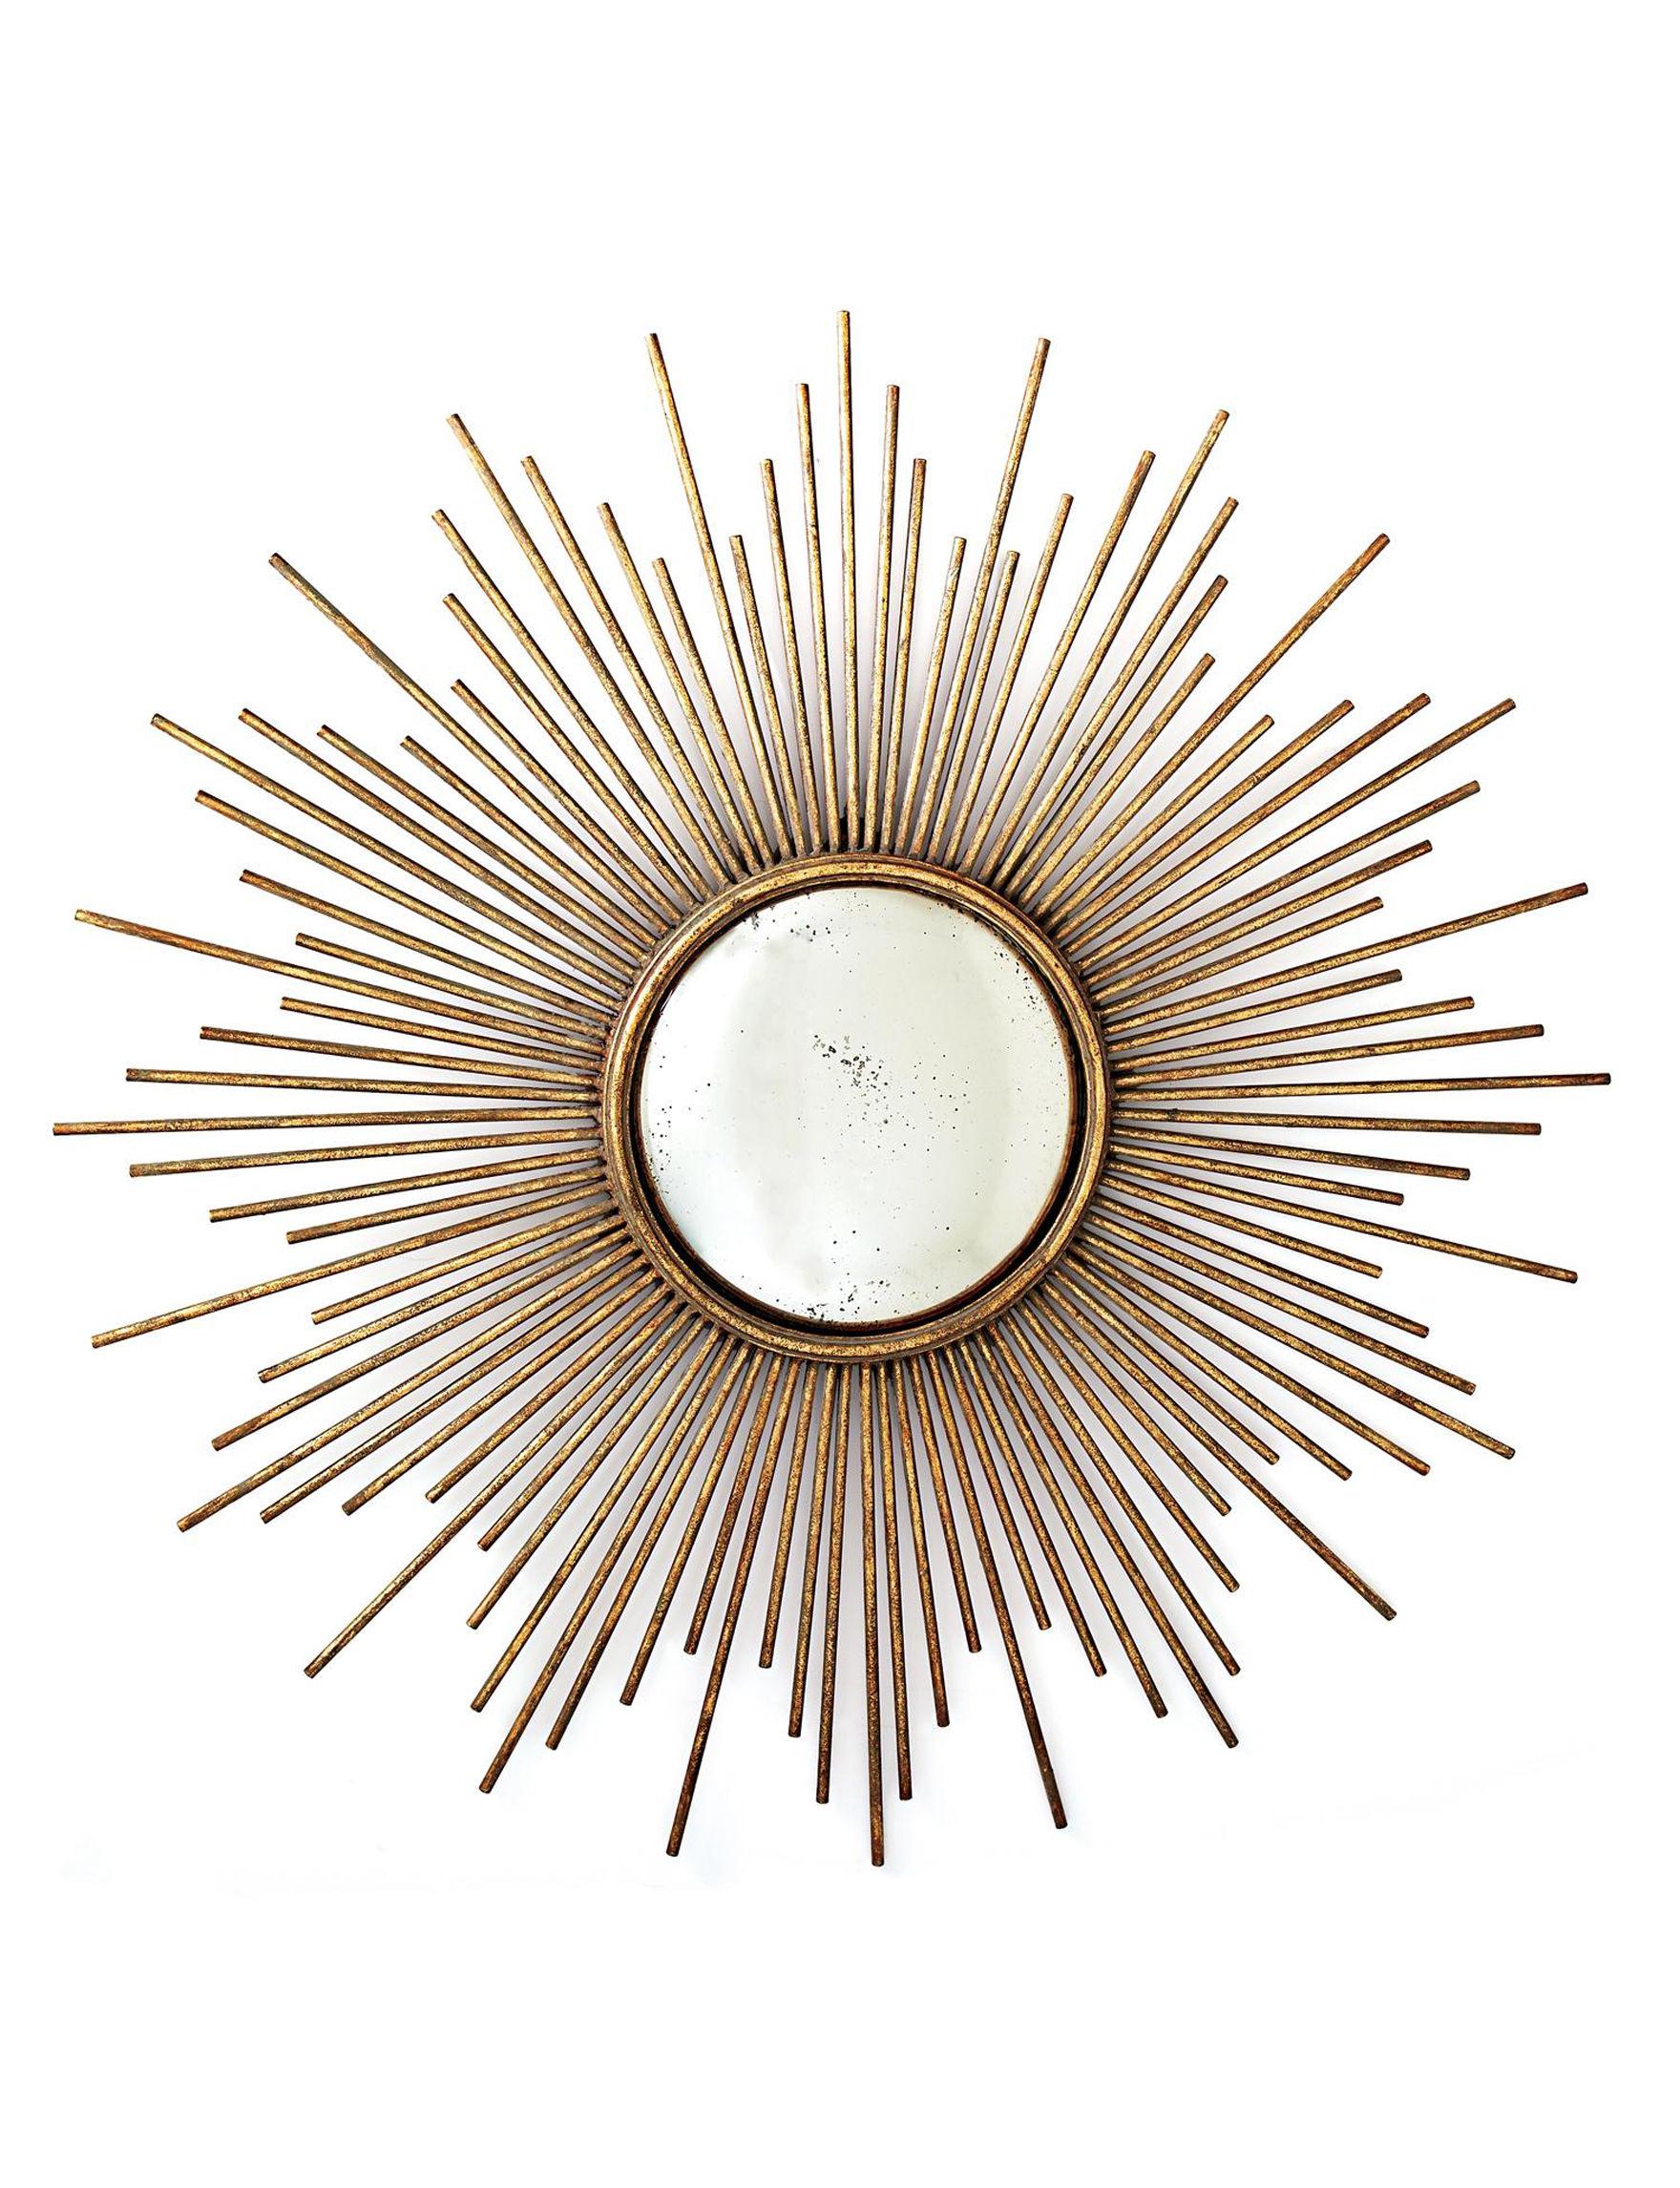 Two's Company Gold Mirrors Wall Decor